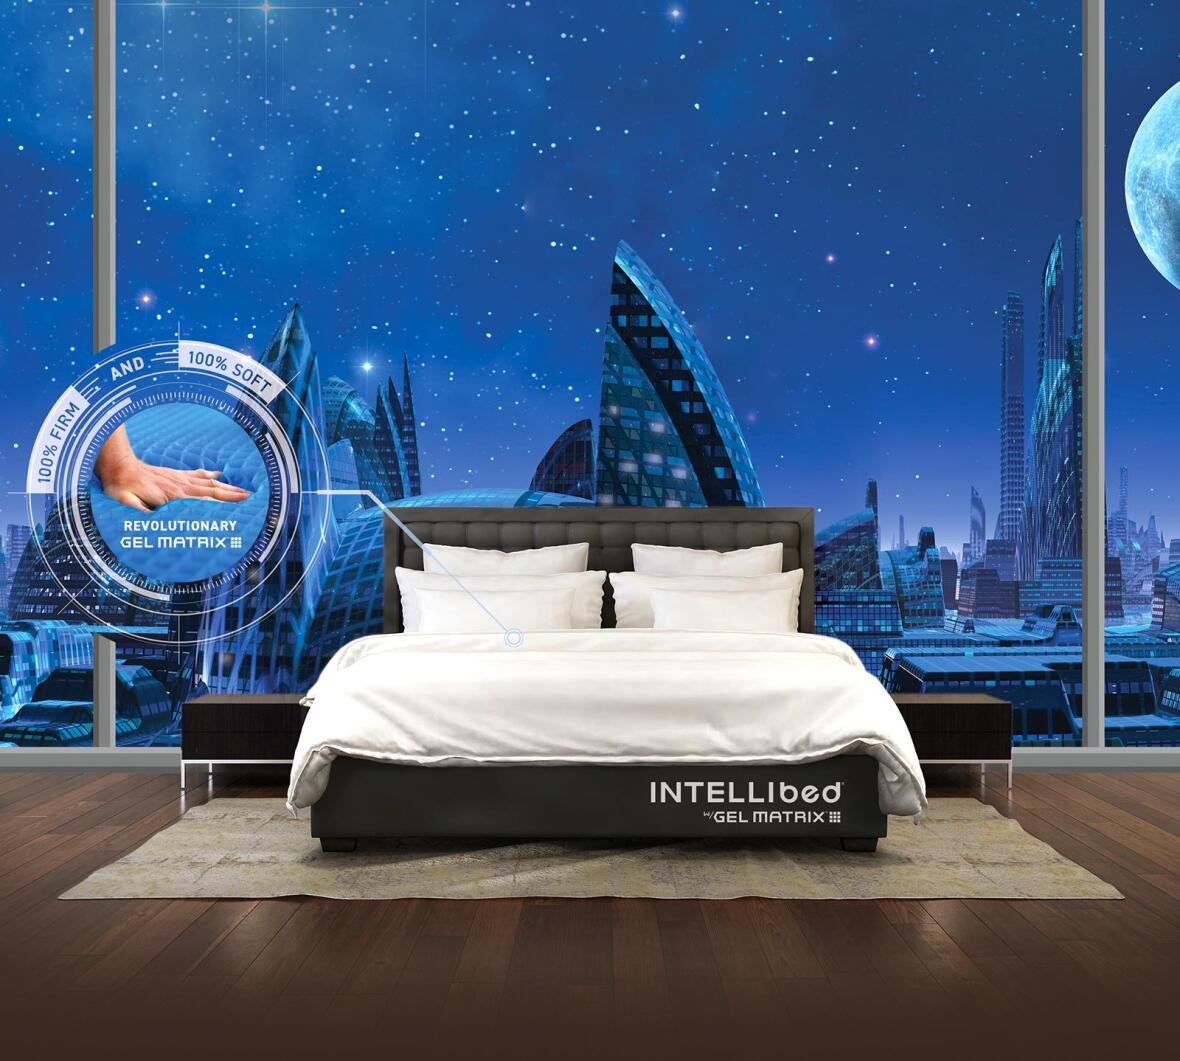 130131_INTELLIbed_Intellibed Nightfall Luxury Plush Mattress (1).jpg